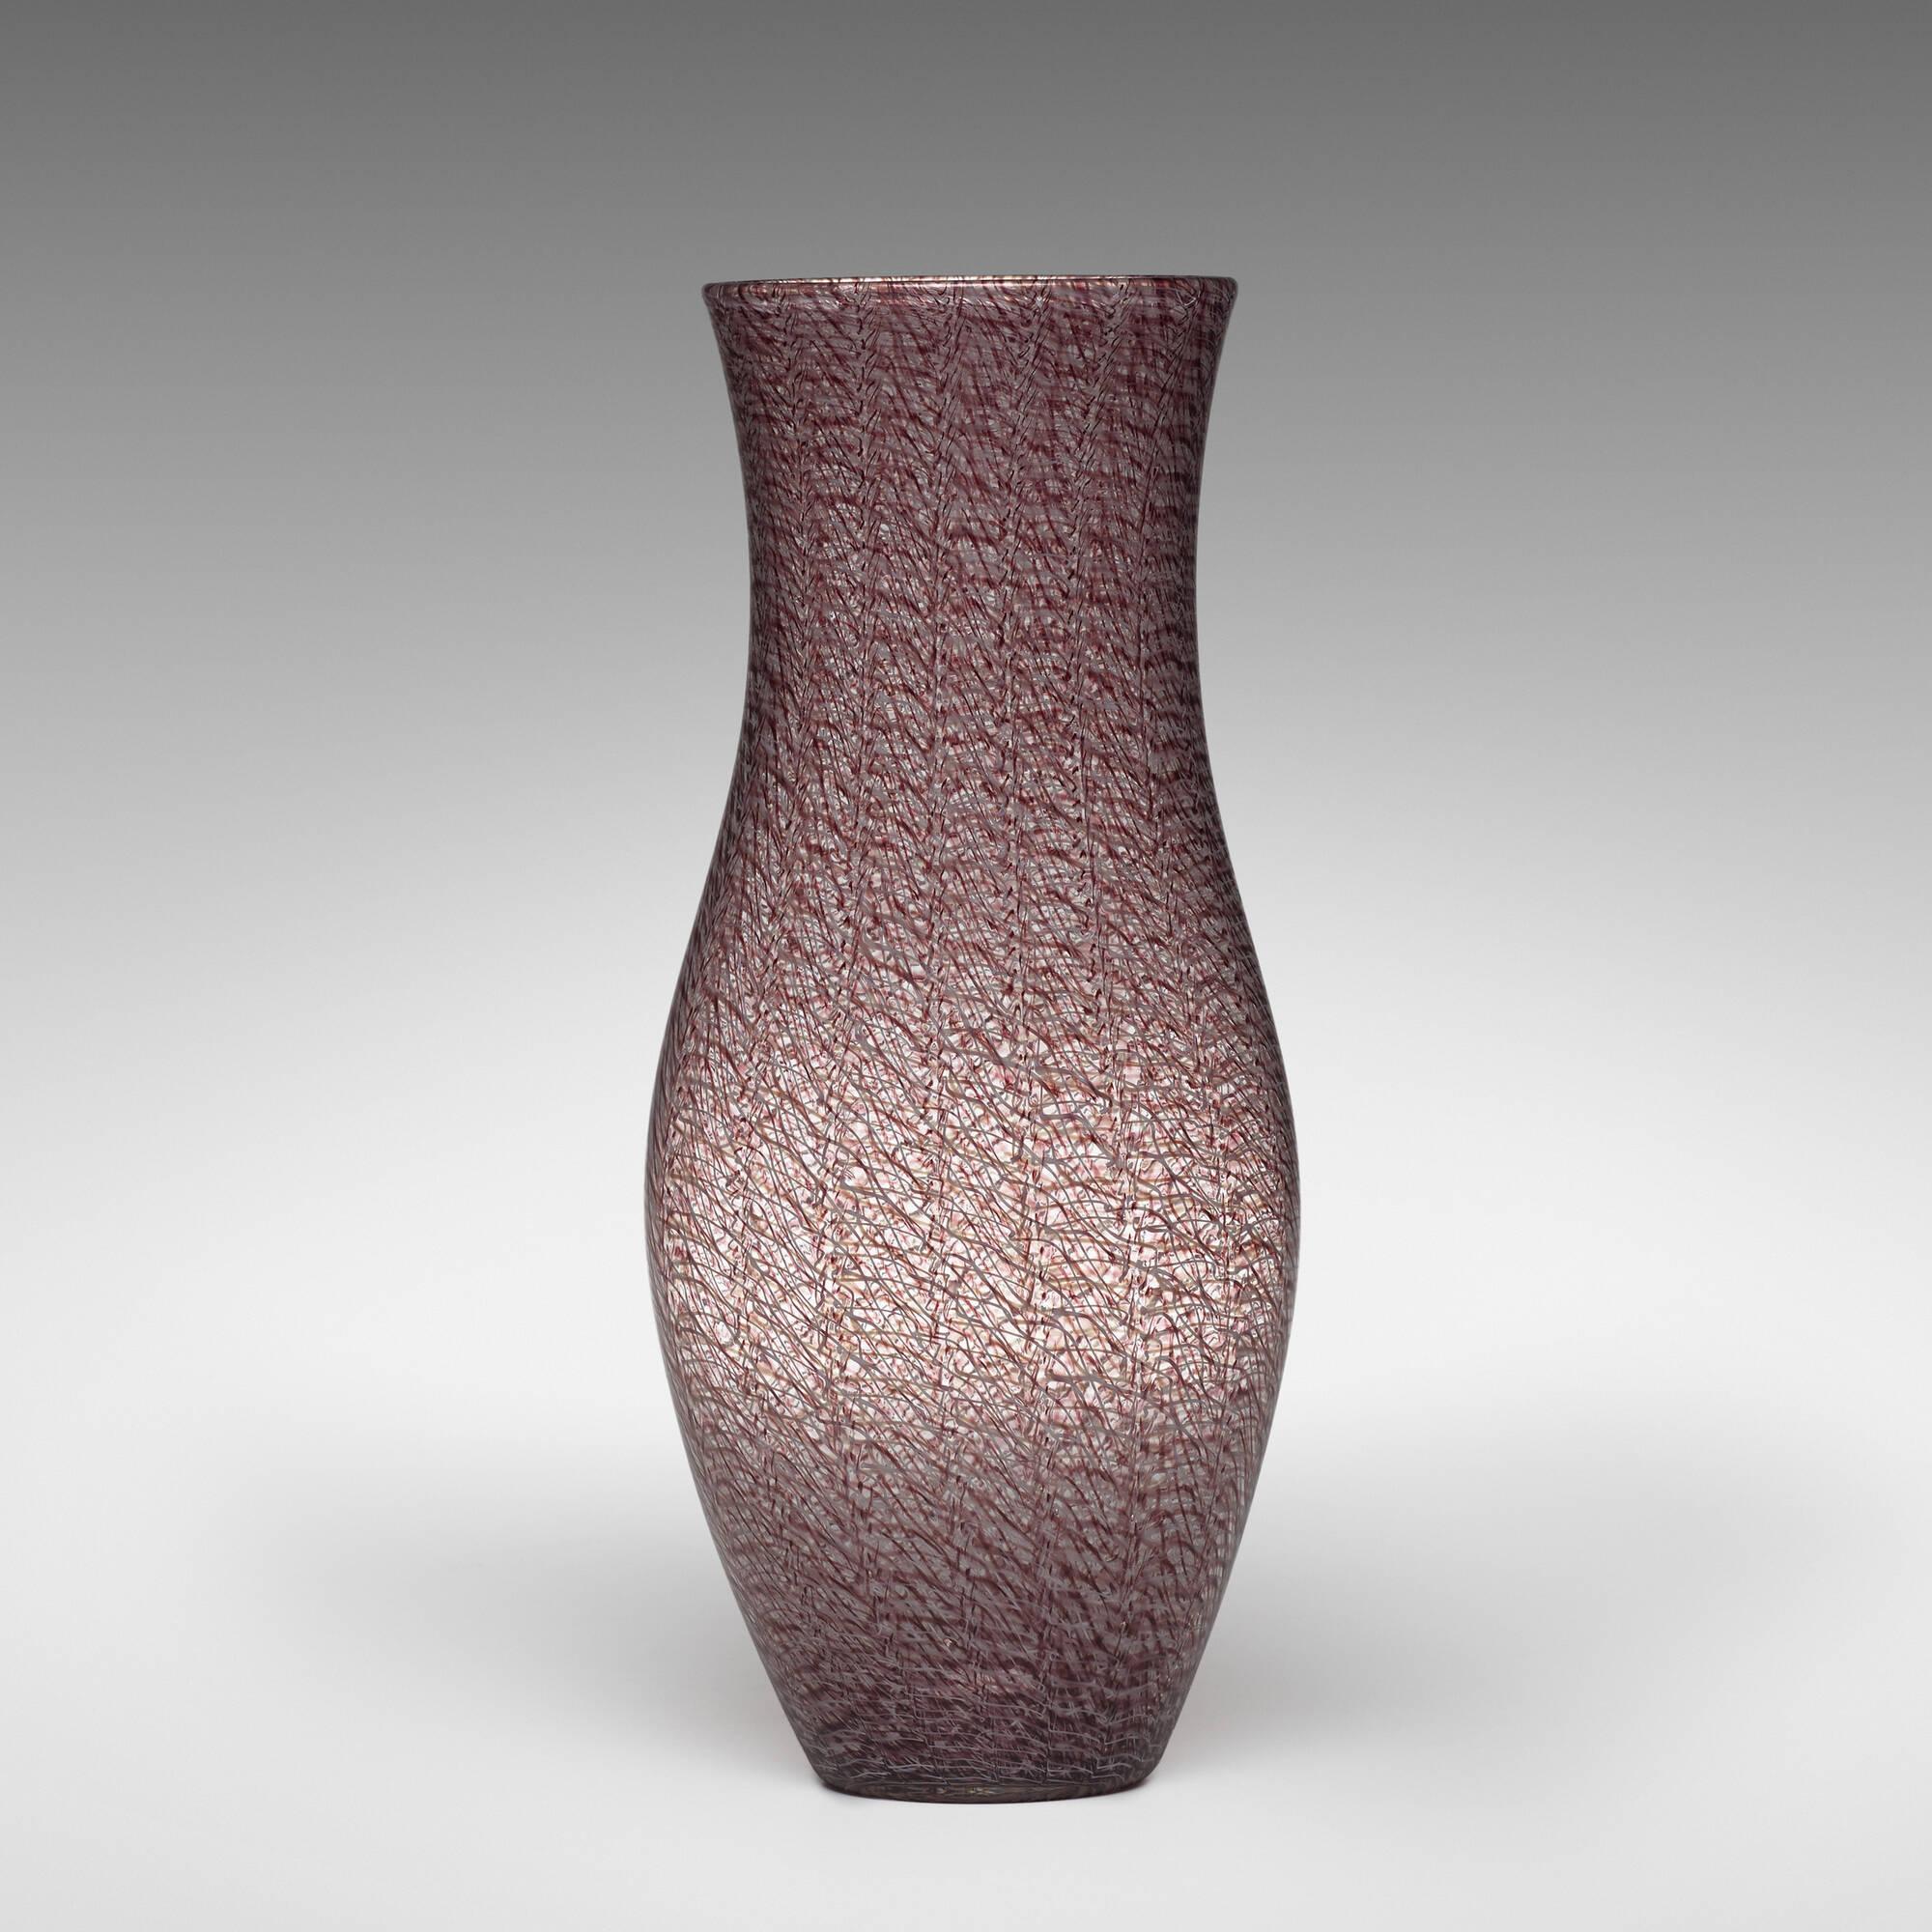 169: Archimede Seguso / Merletto vase (1 of 3)